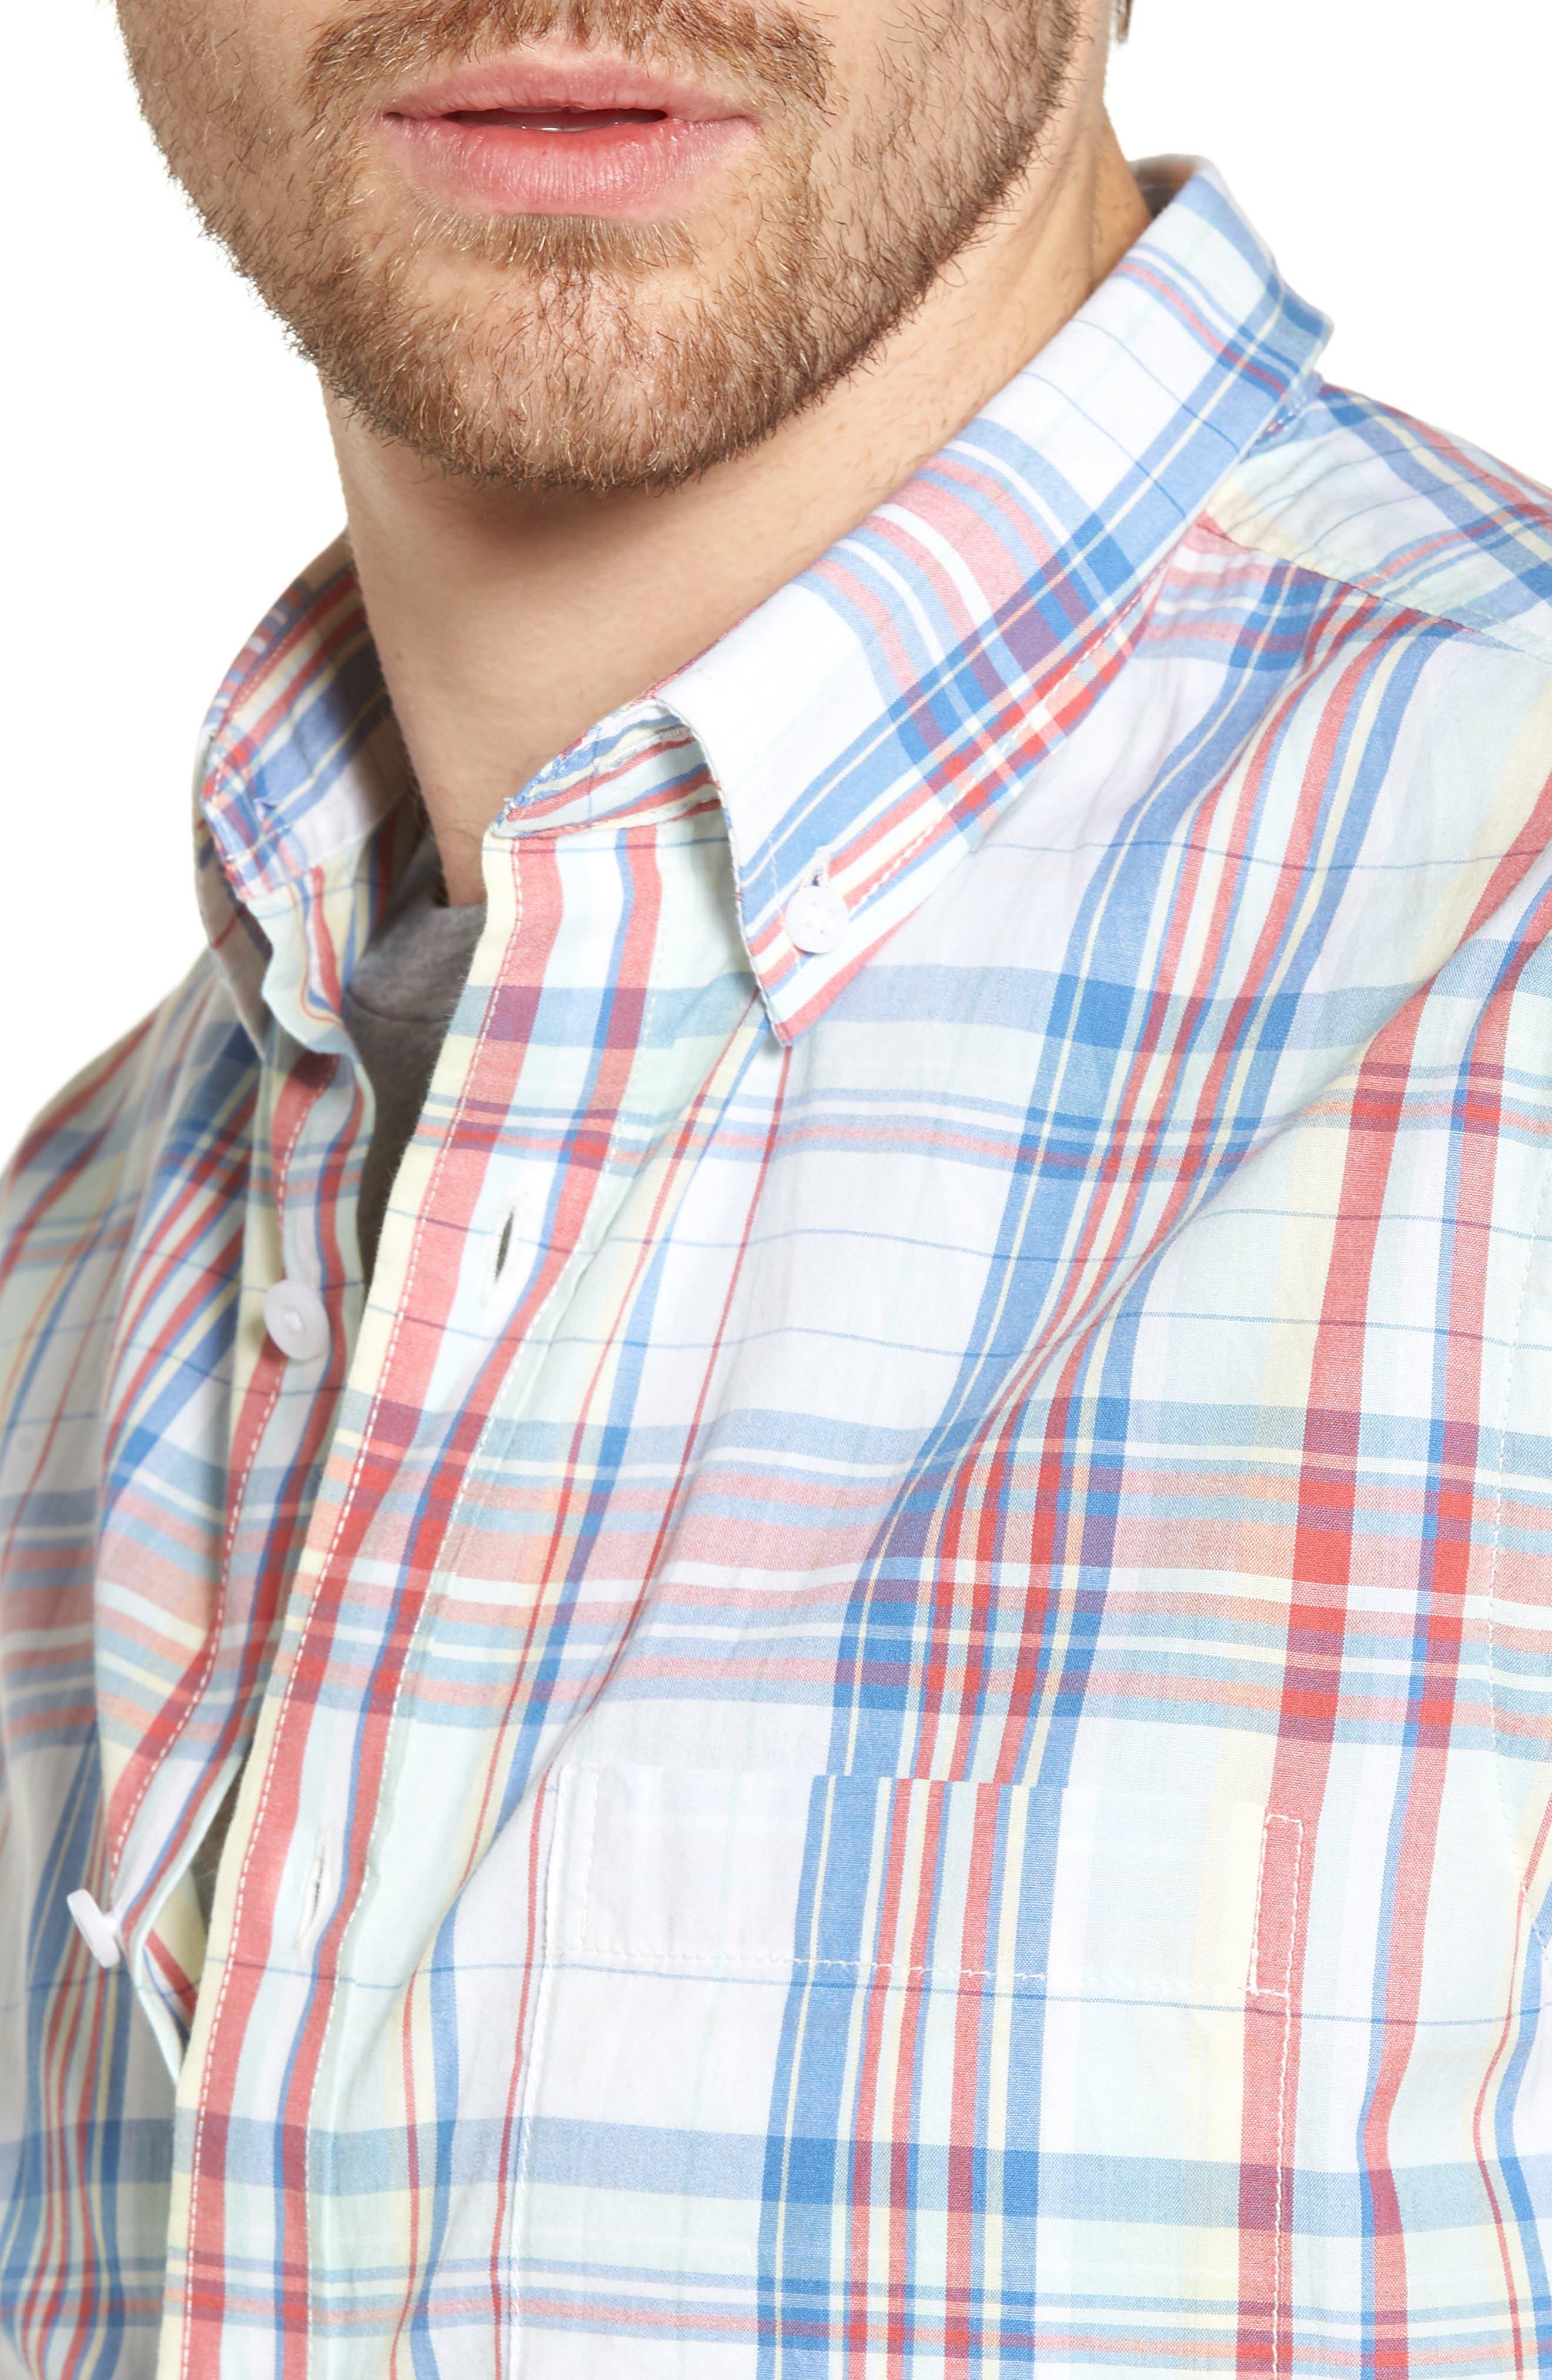 Trim Fit Plaid Short Sleeve Sport Shirt,                             Alternate thumbnail 2, color,                             White Red Multi Plaid